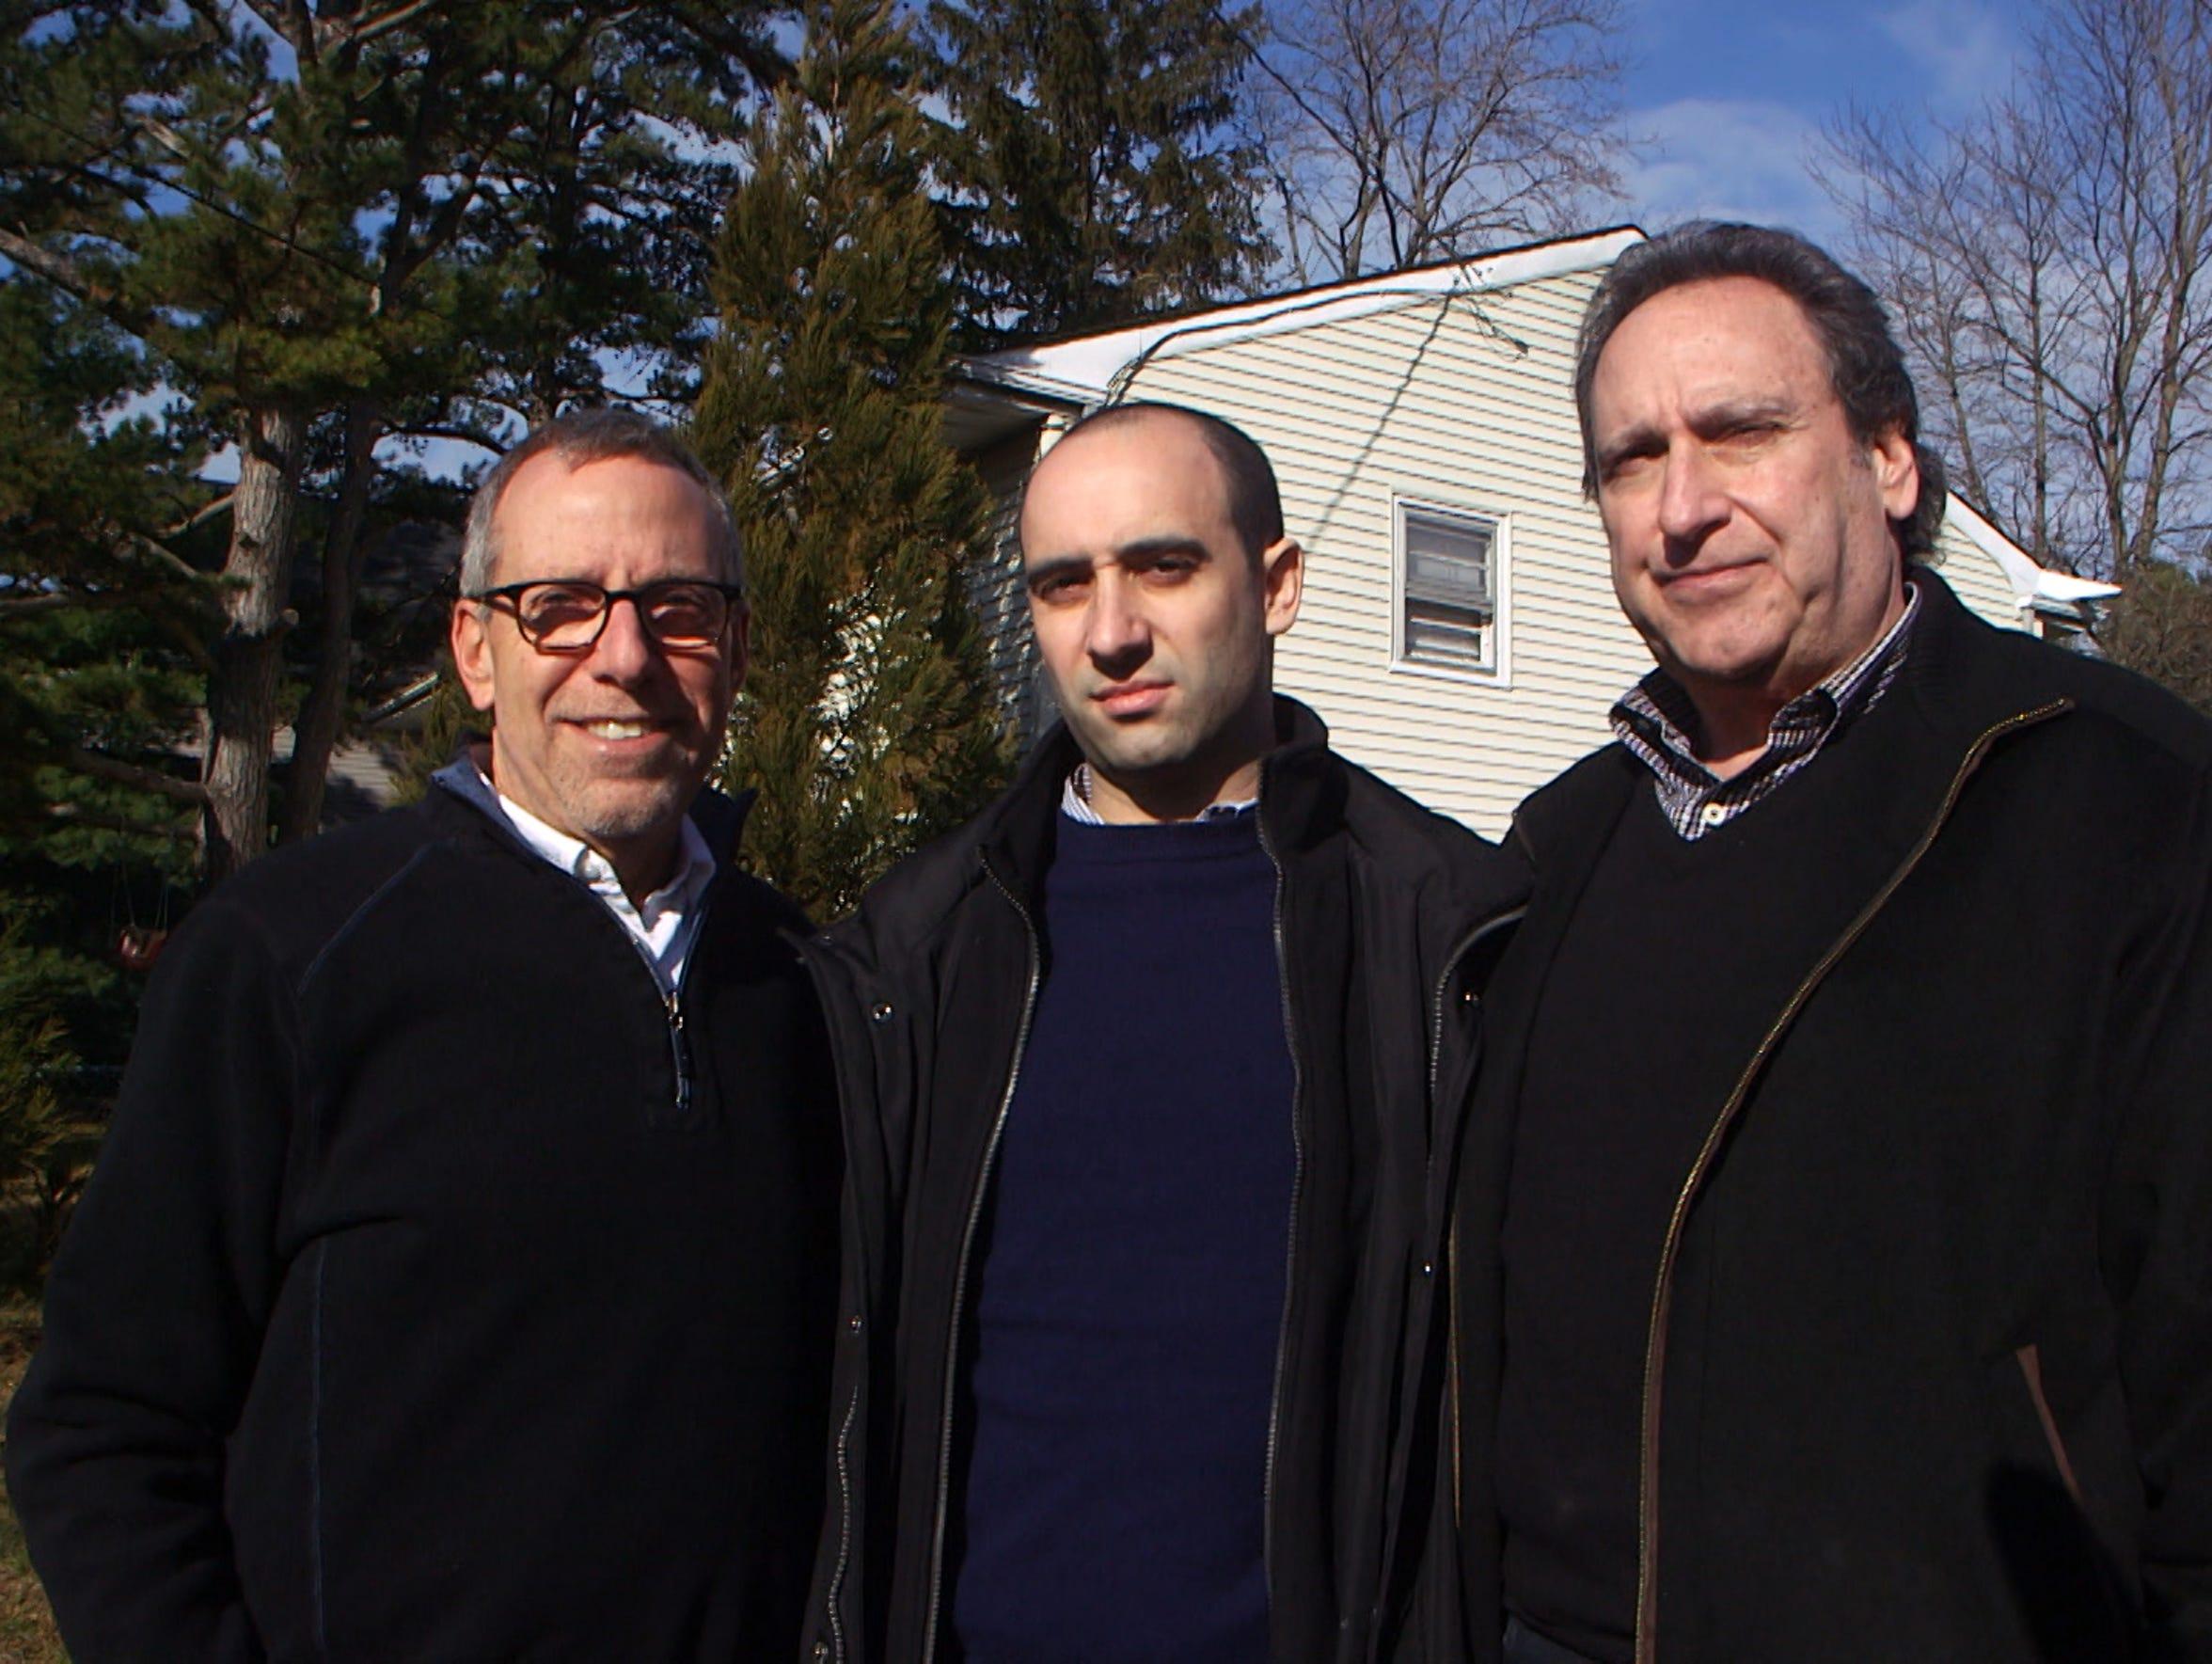 Brothers Harvey and David Sass pose with David's son